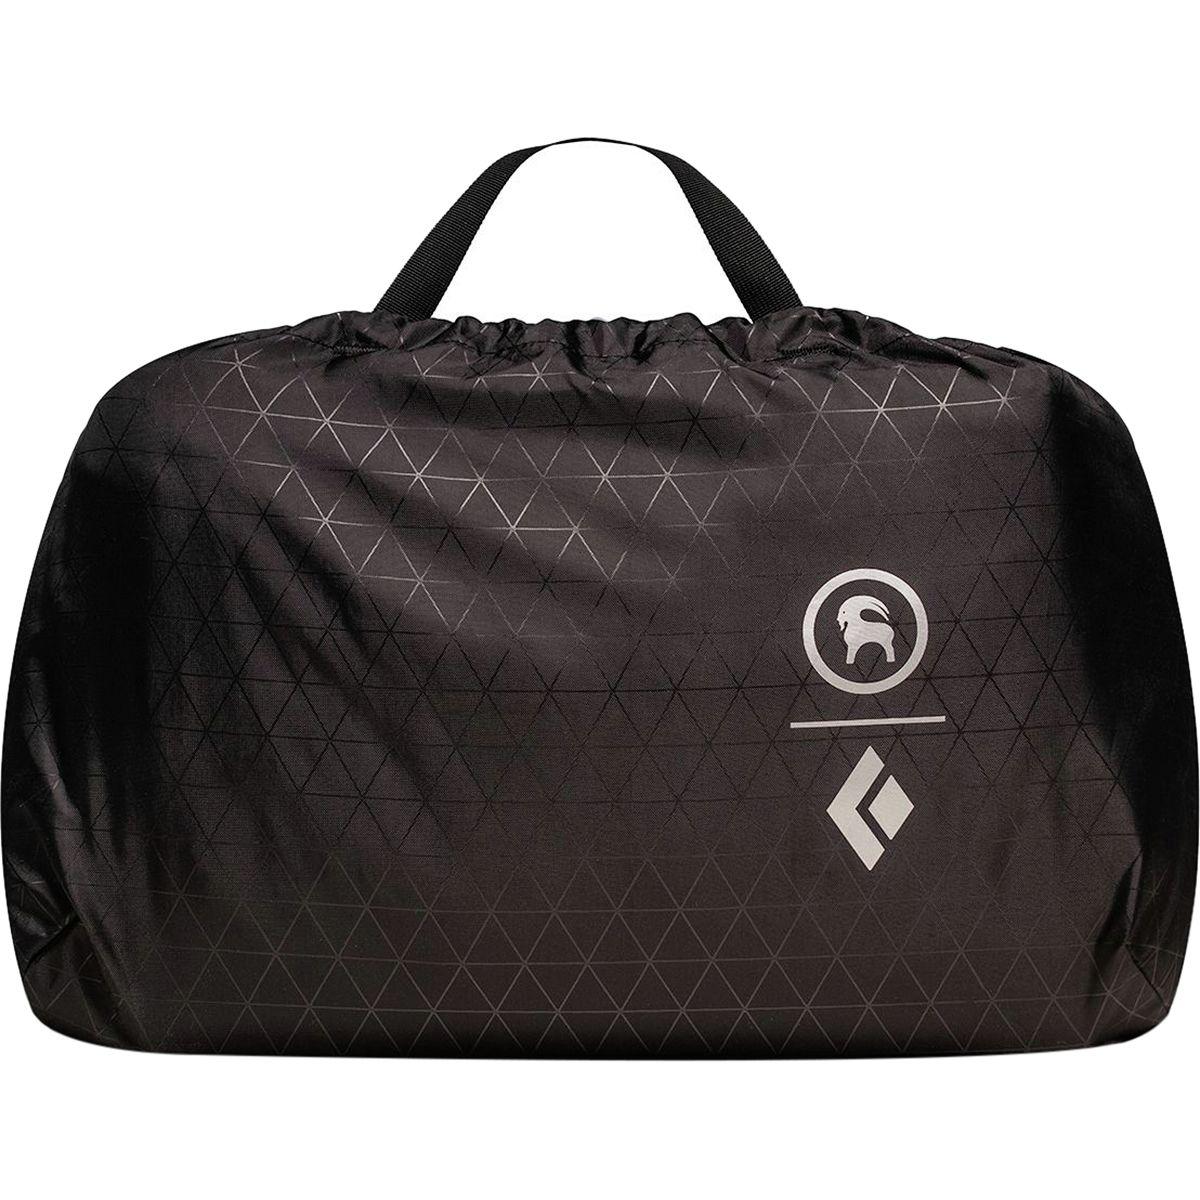 Backcountry x Black Diamond Stone Garden Rope Bag Black, One Size